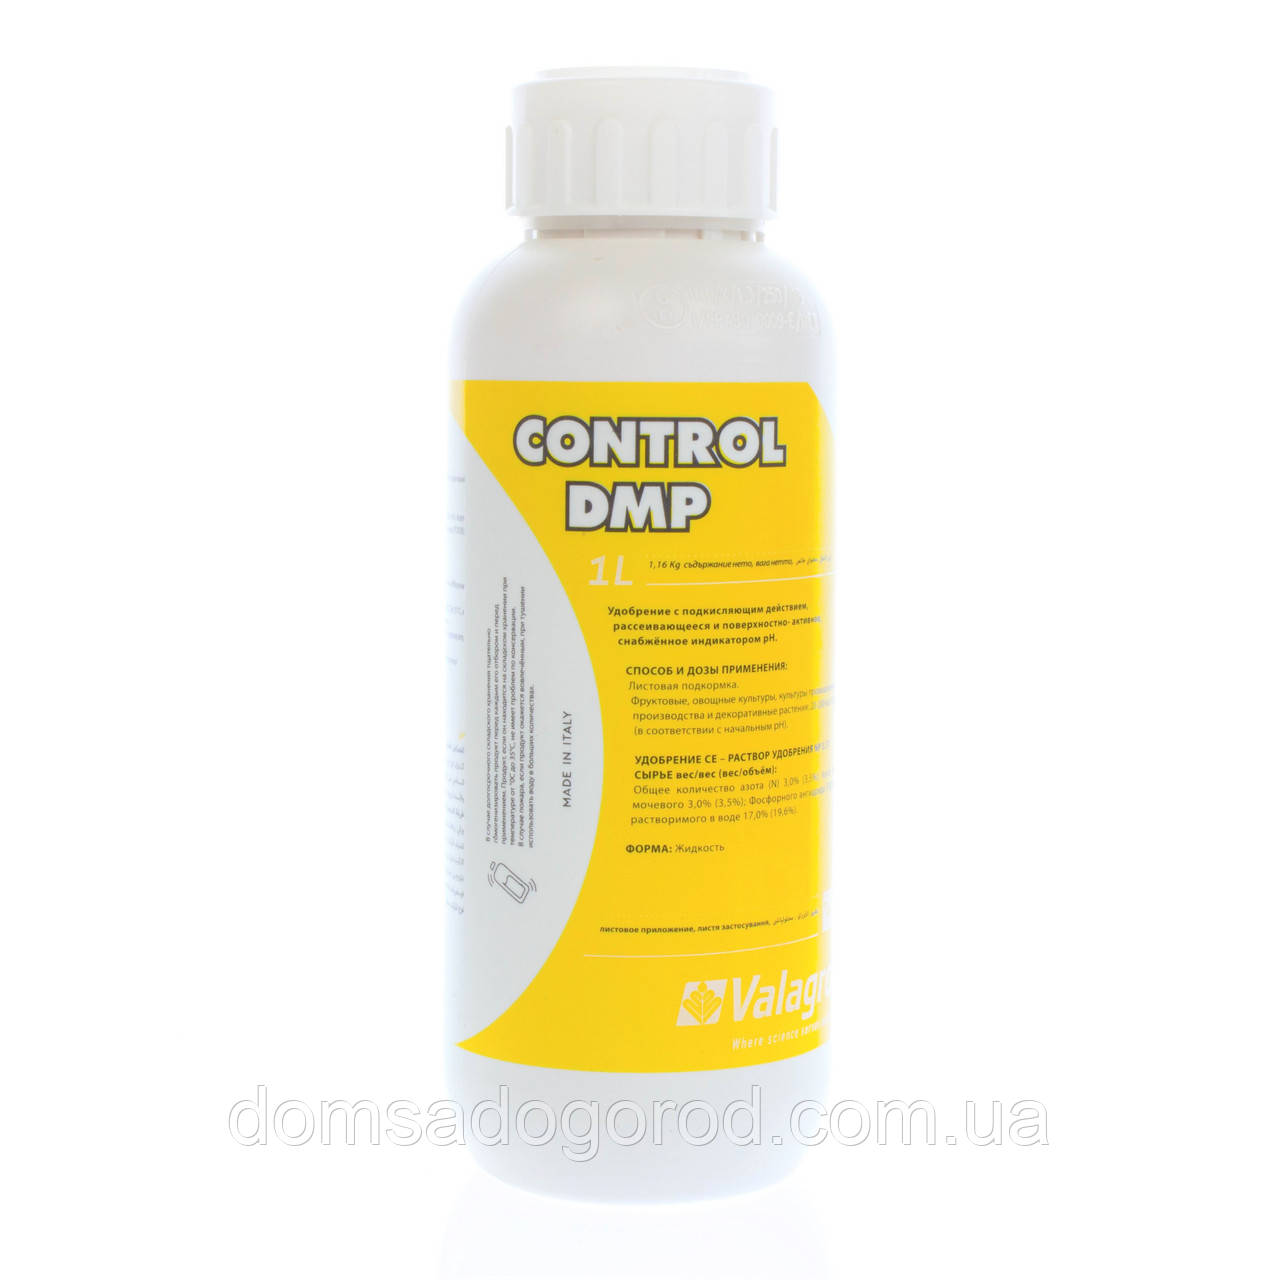 Регулятор кислотности Control DMP (Контроль ДМП) Valagro 1 л